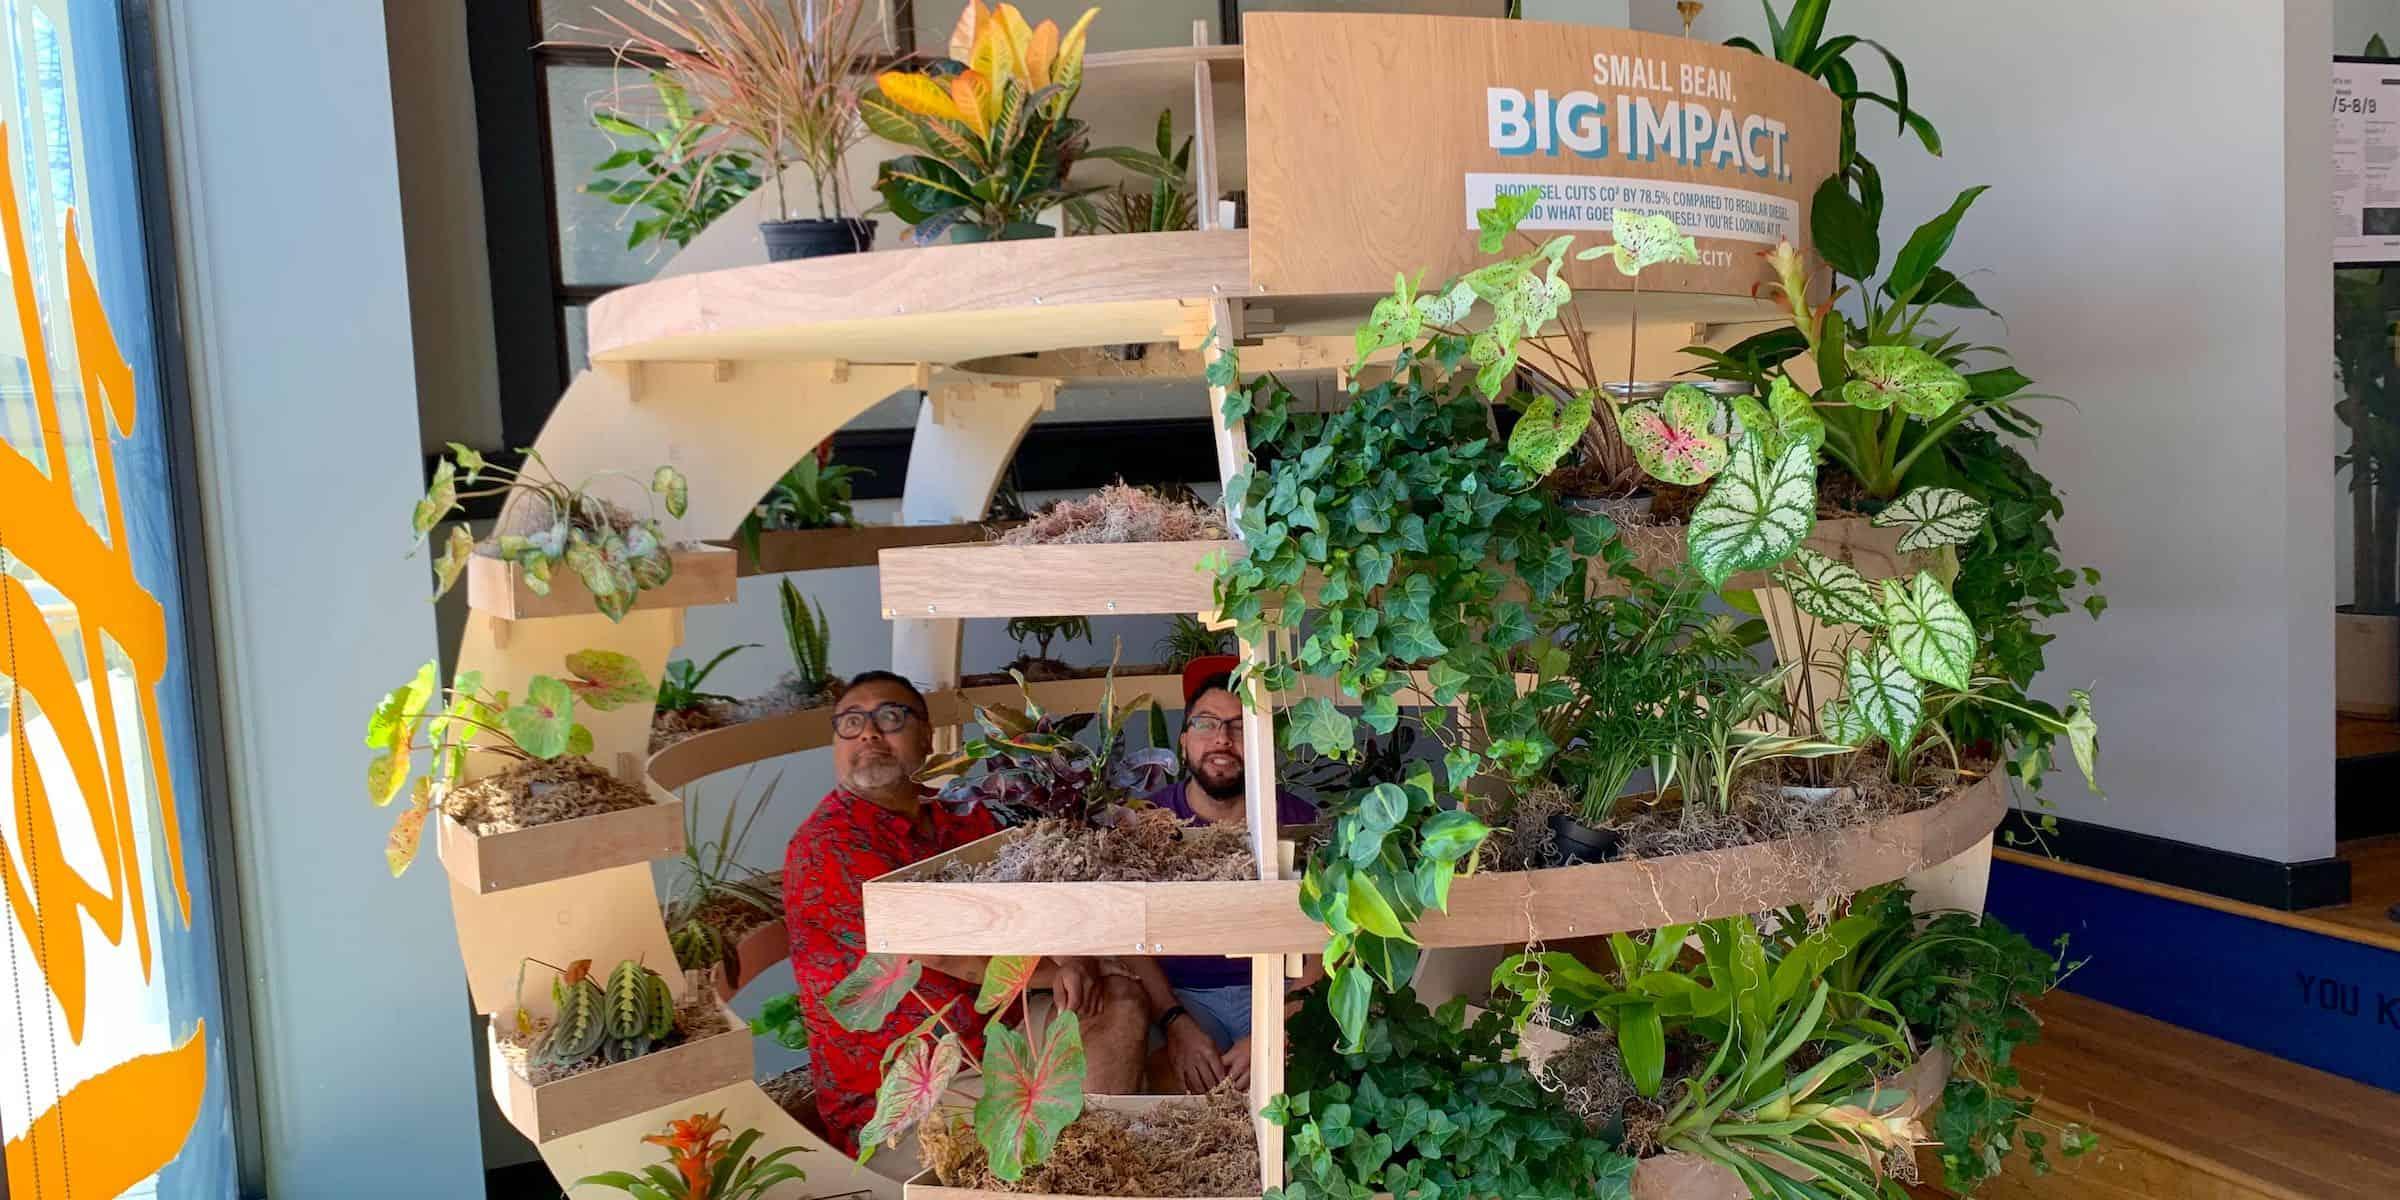 Live Plant Flora Brand Immersive Installation - Chicago